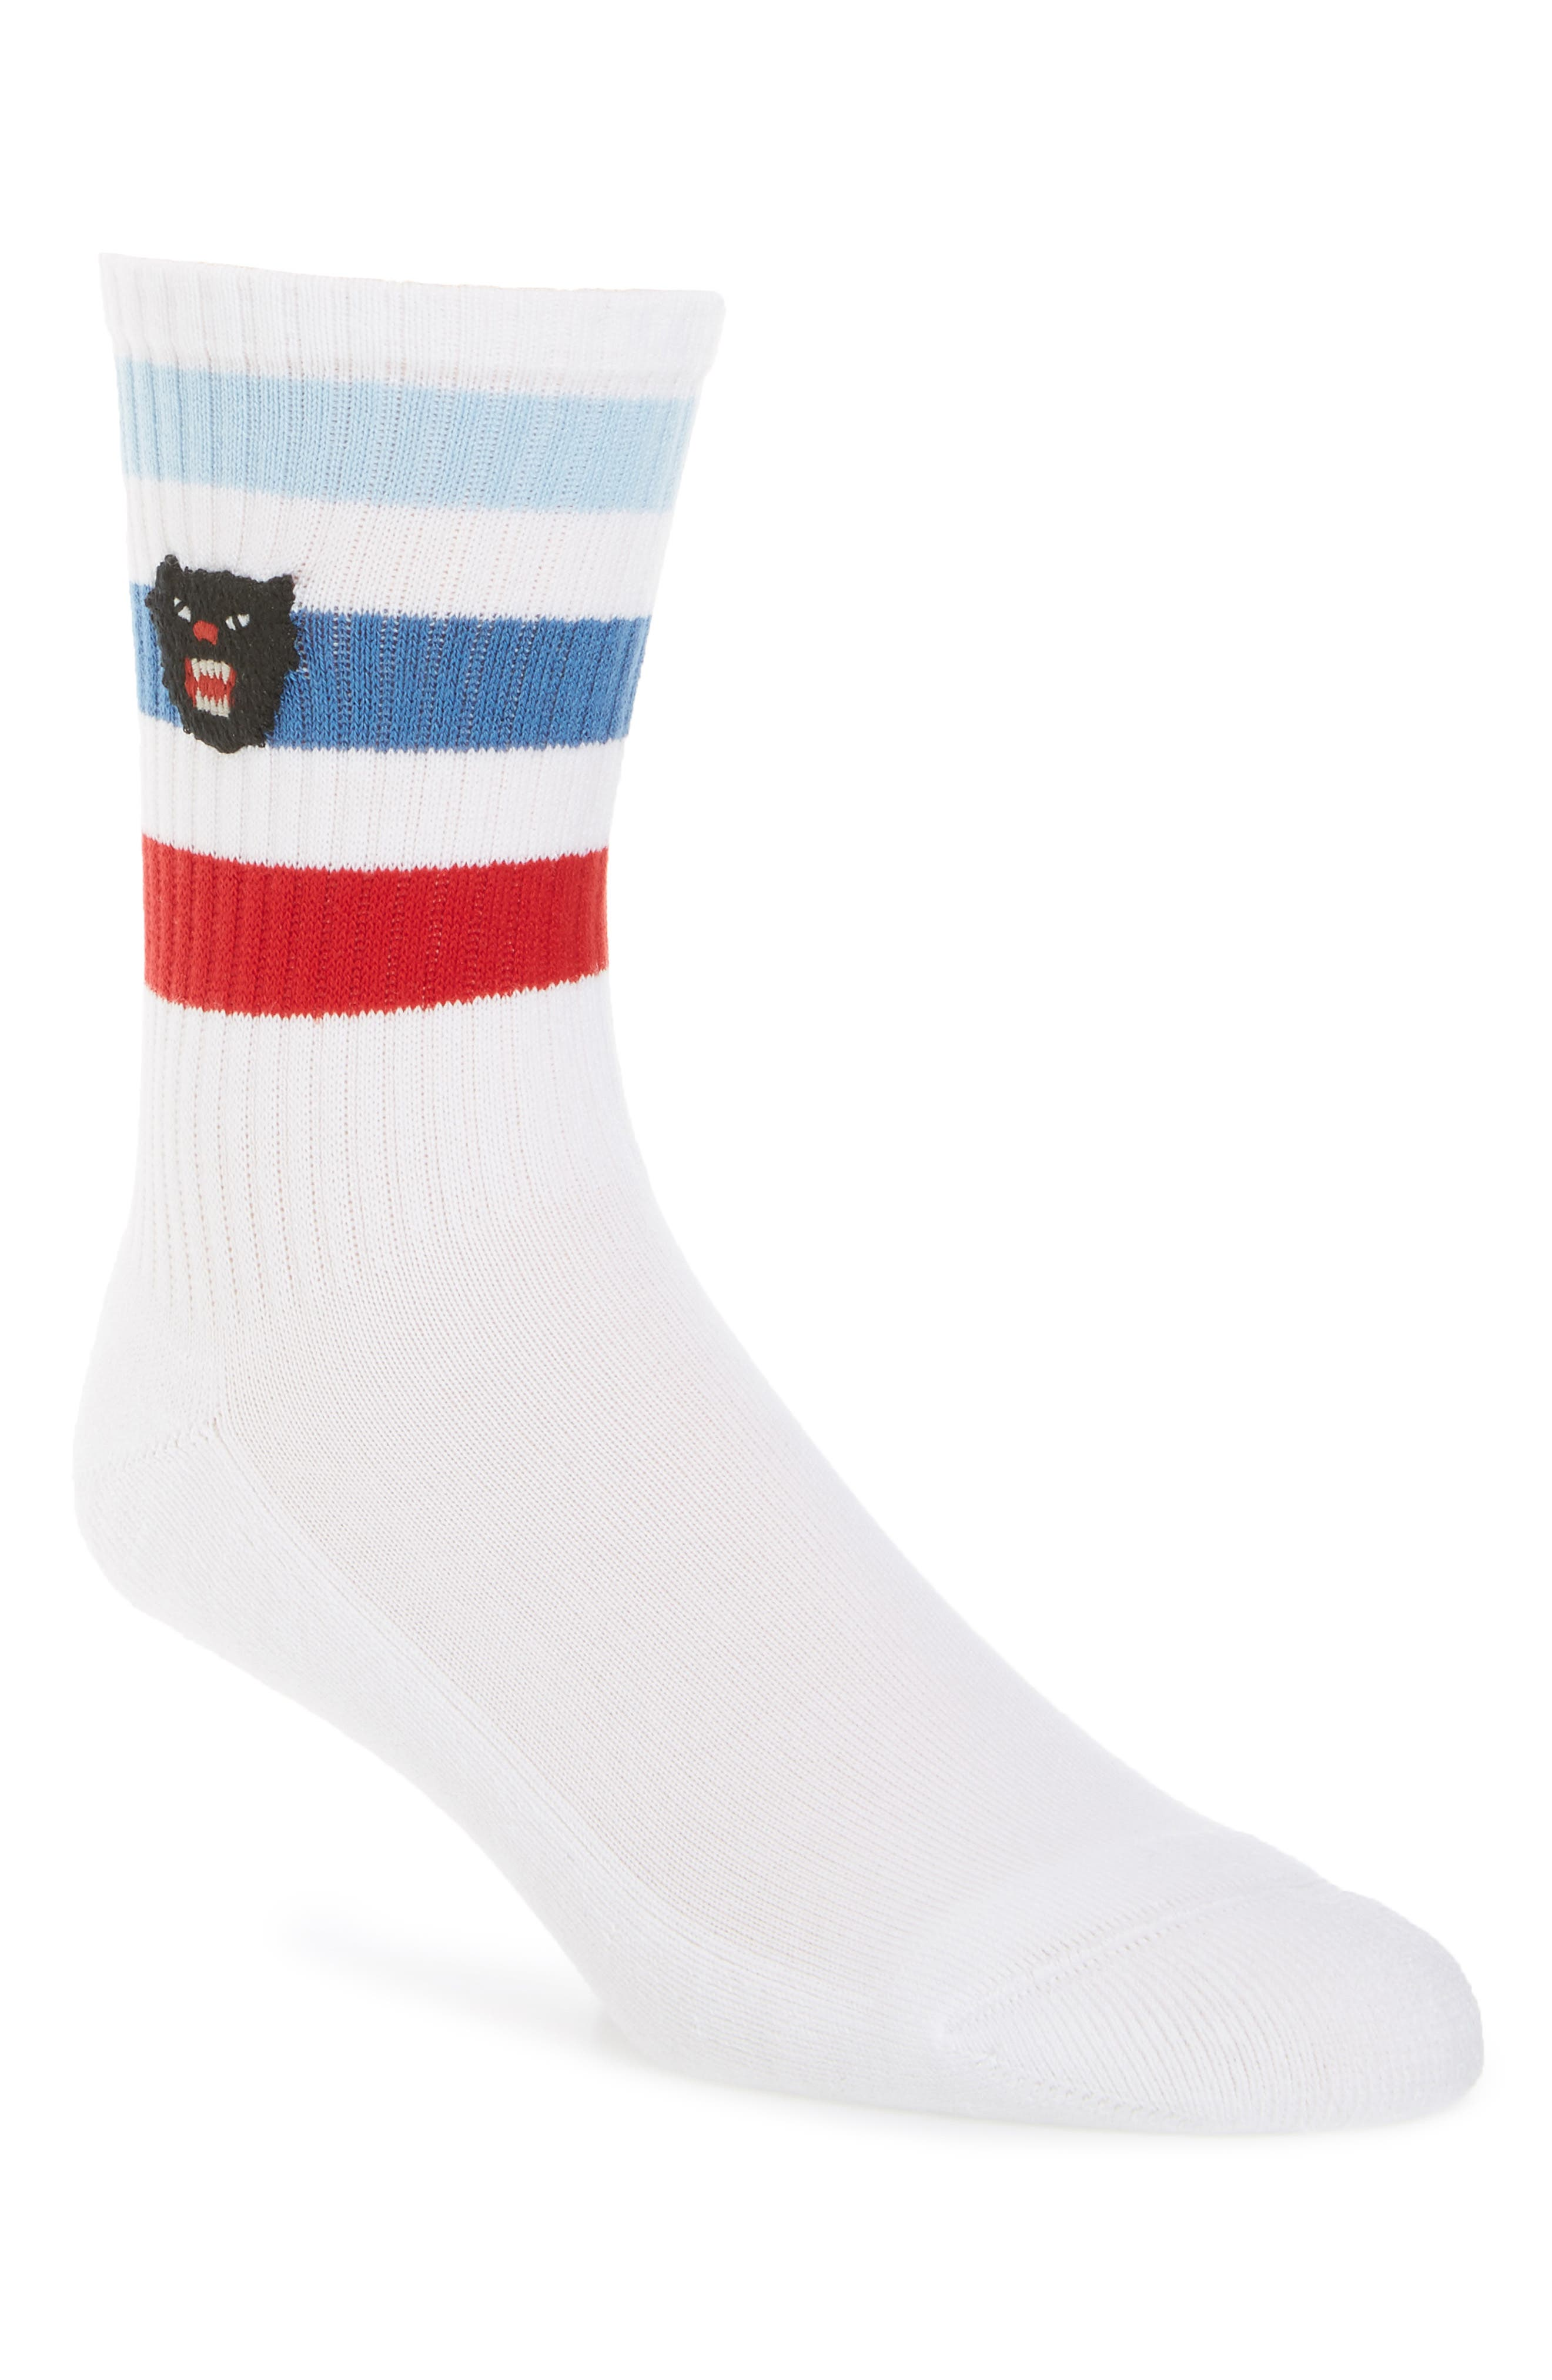 Puma Patch Socks,                         Main,                         color, White